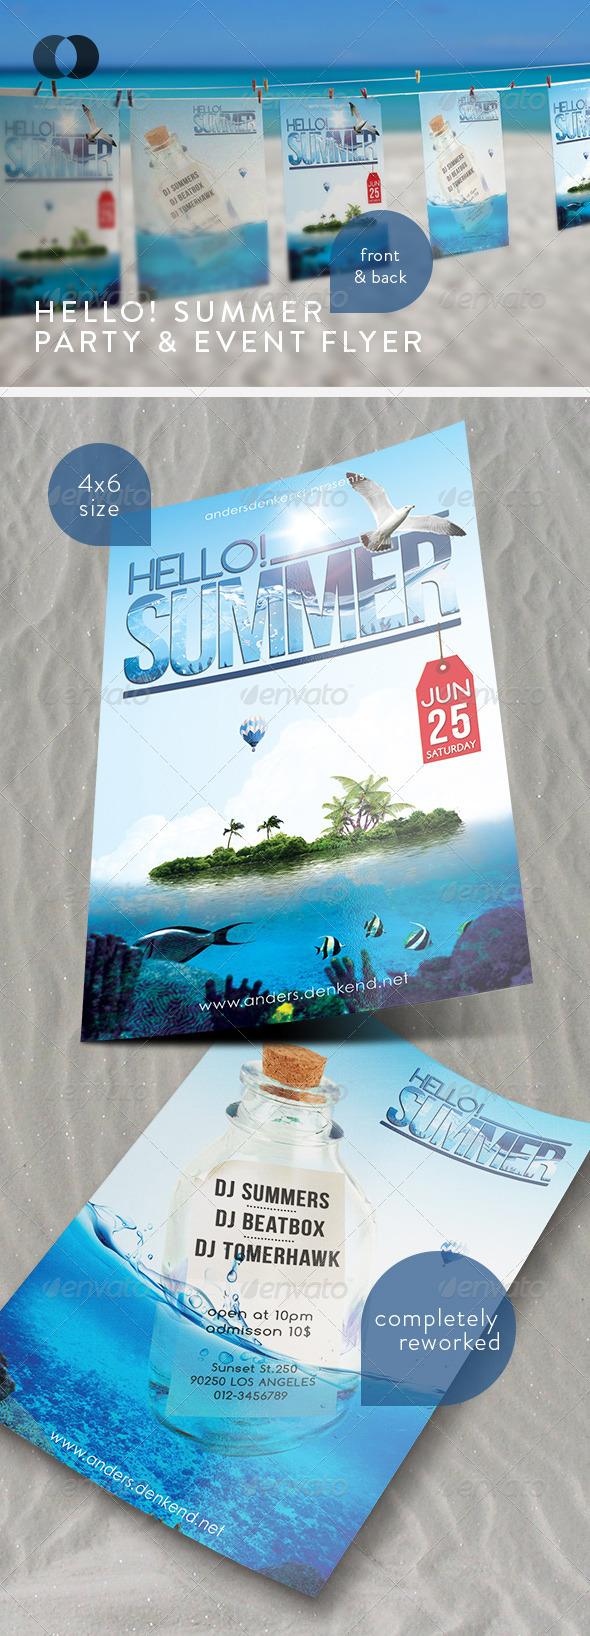 GraphicRiver Music & Event Flyer Hello Summer 263139